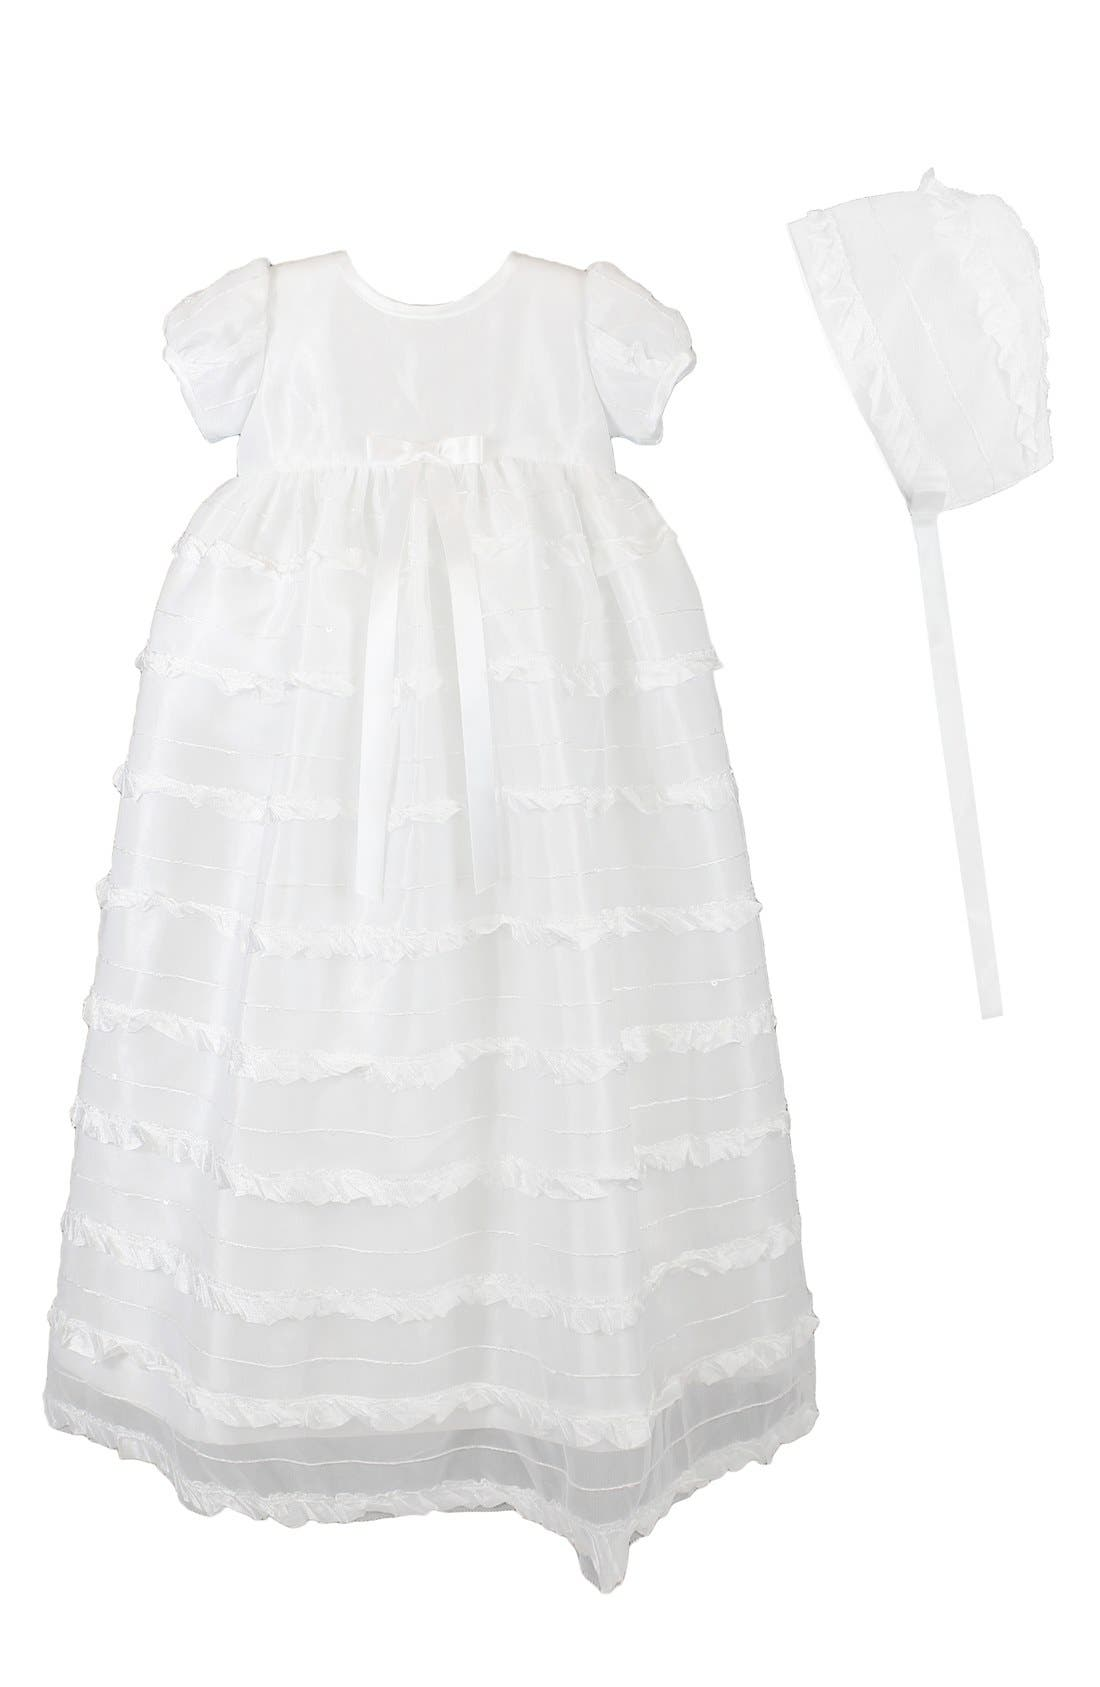 C.I. Castro & Co 'Eyelash' Christening Gown & Bonnet,                             Main thumbnail 1, color,                             WHITE